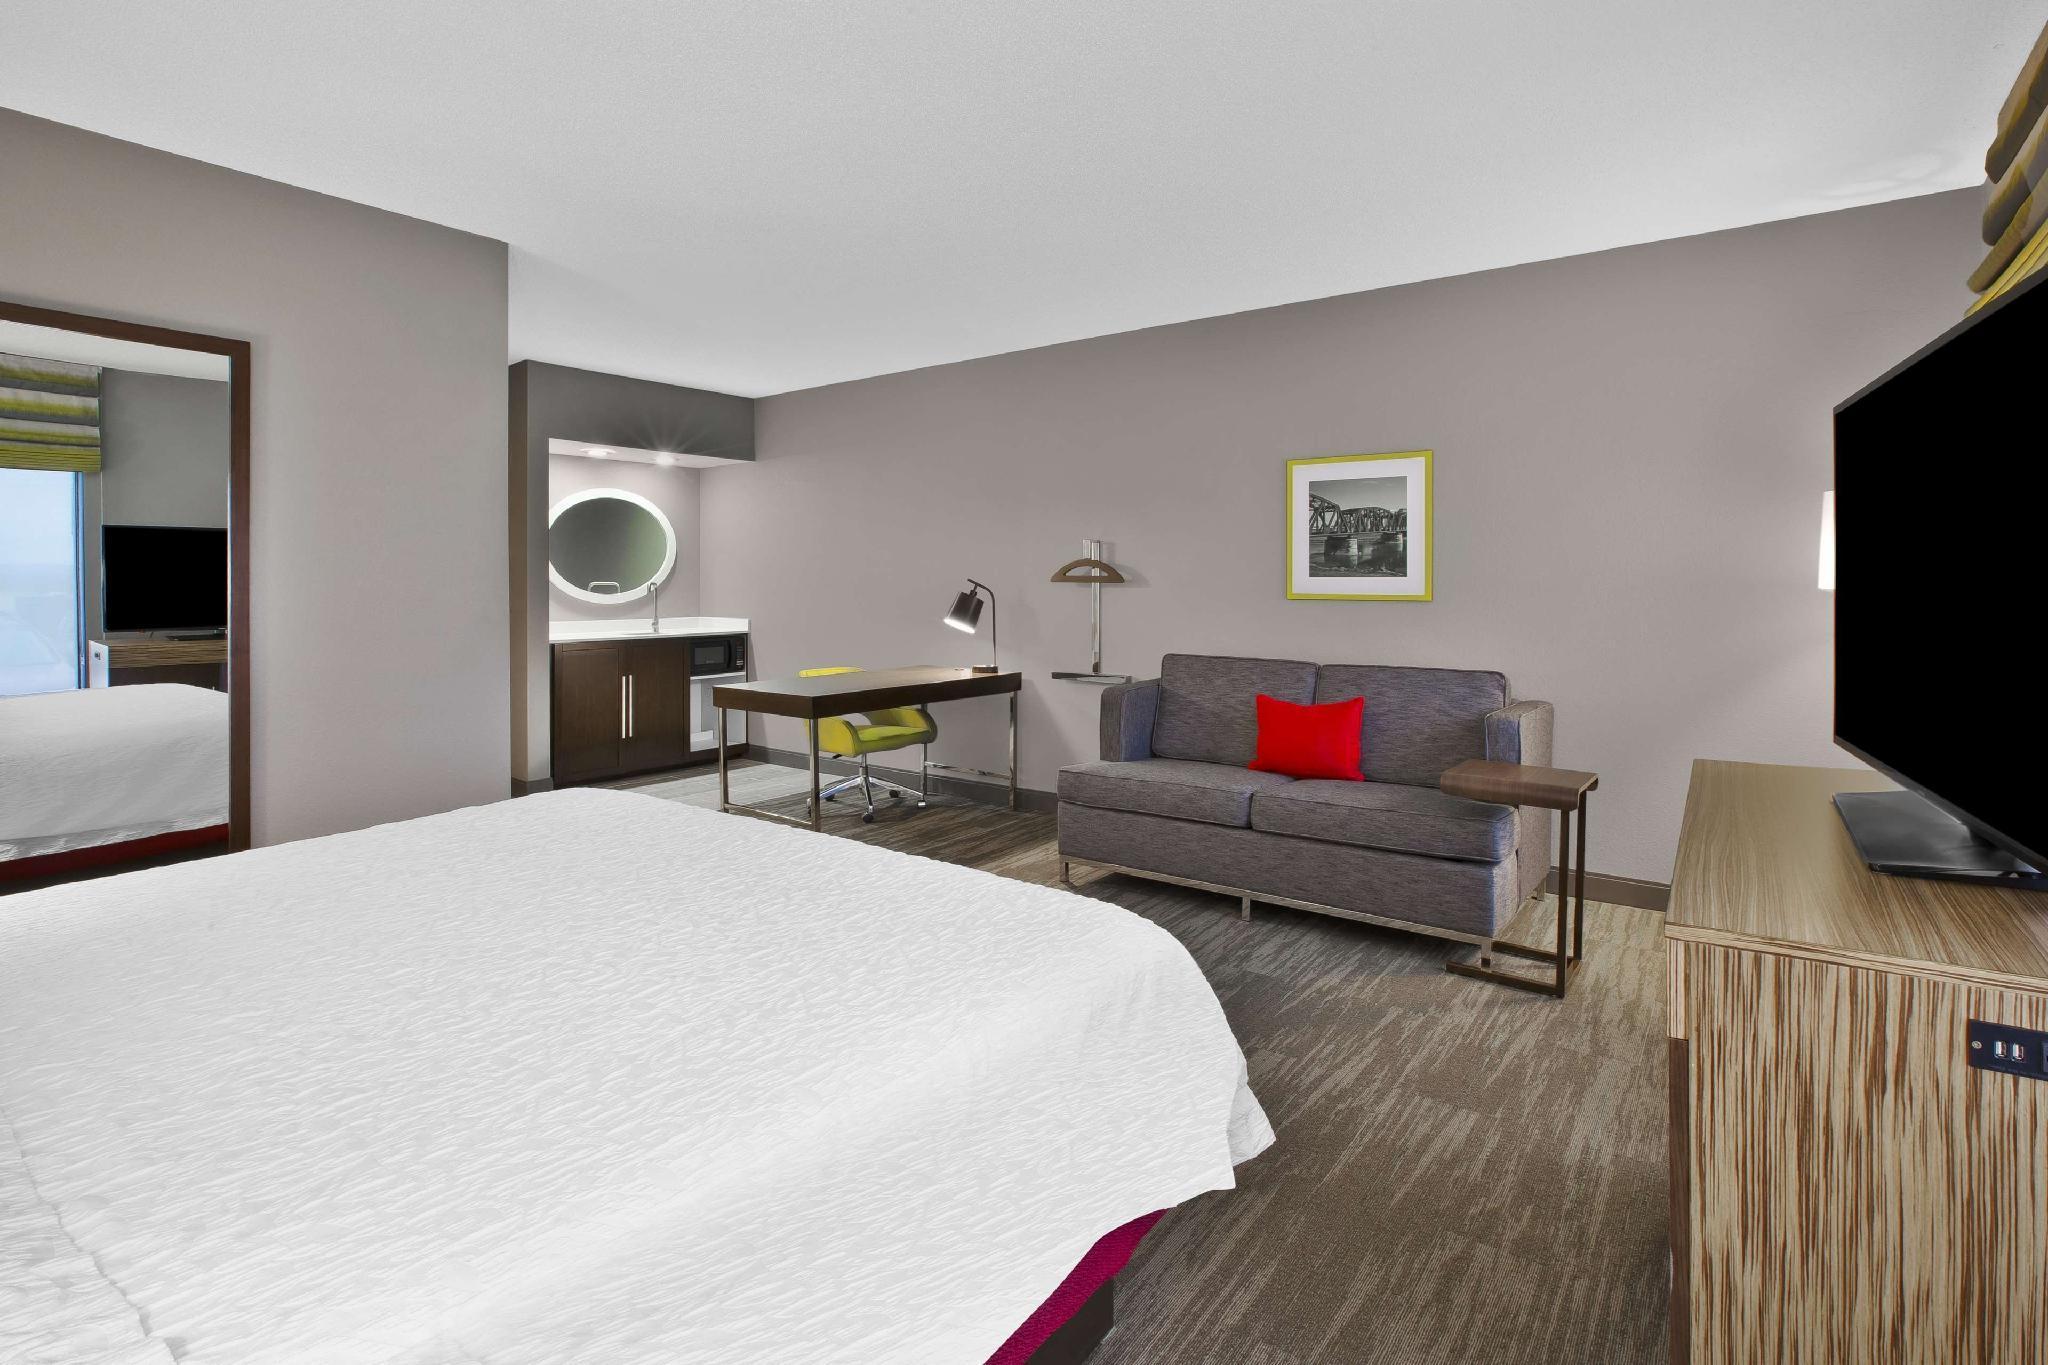 Hampton Inn And Suites Springboro Dayton Area South In Springboro